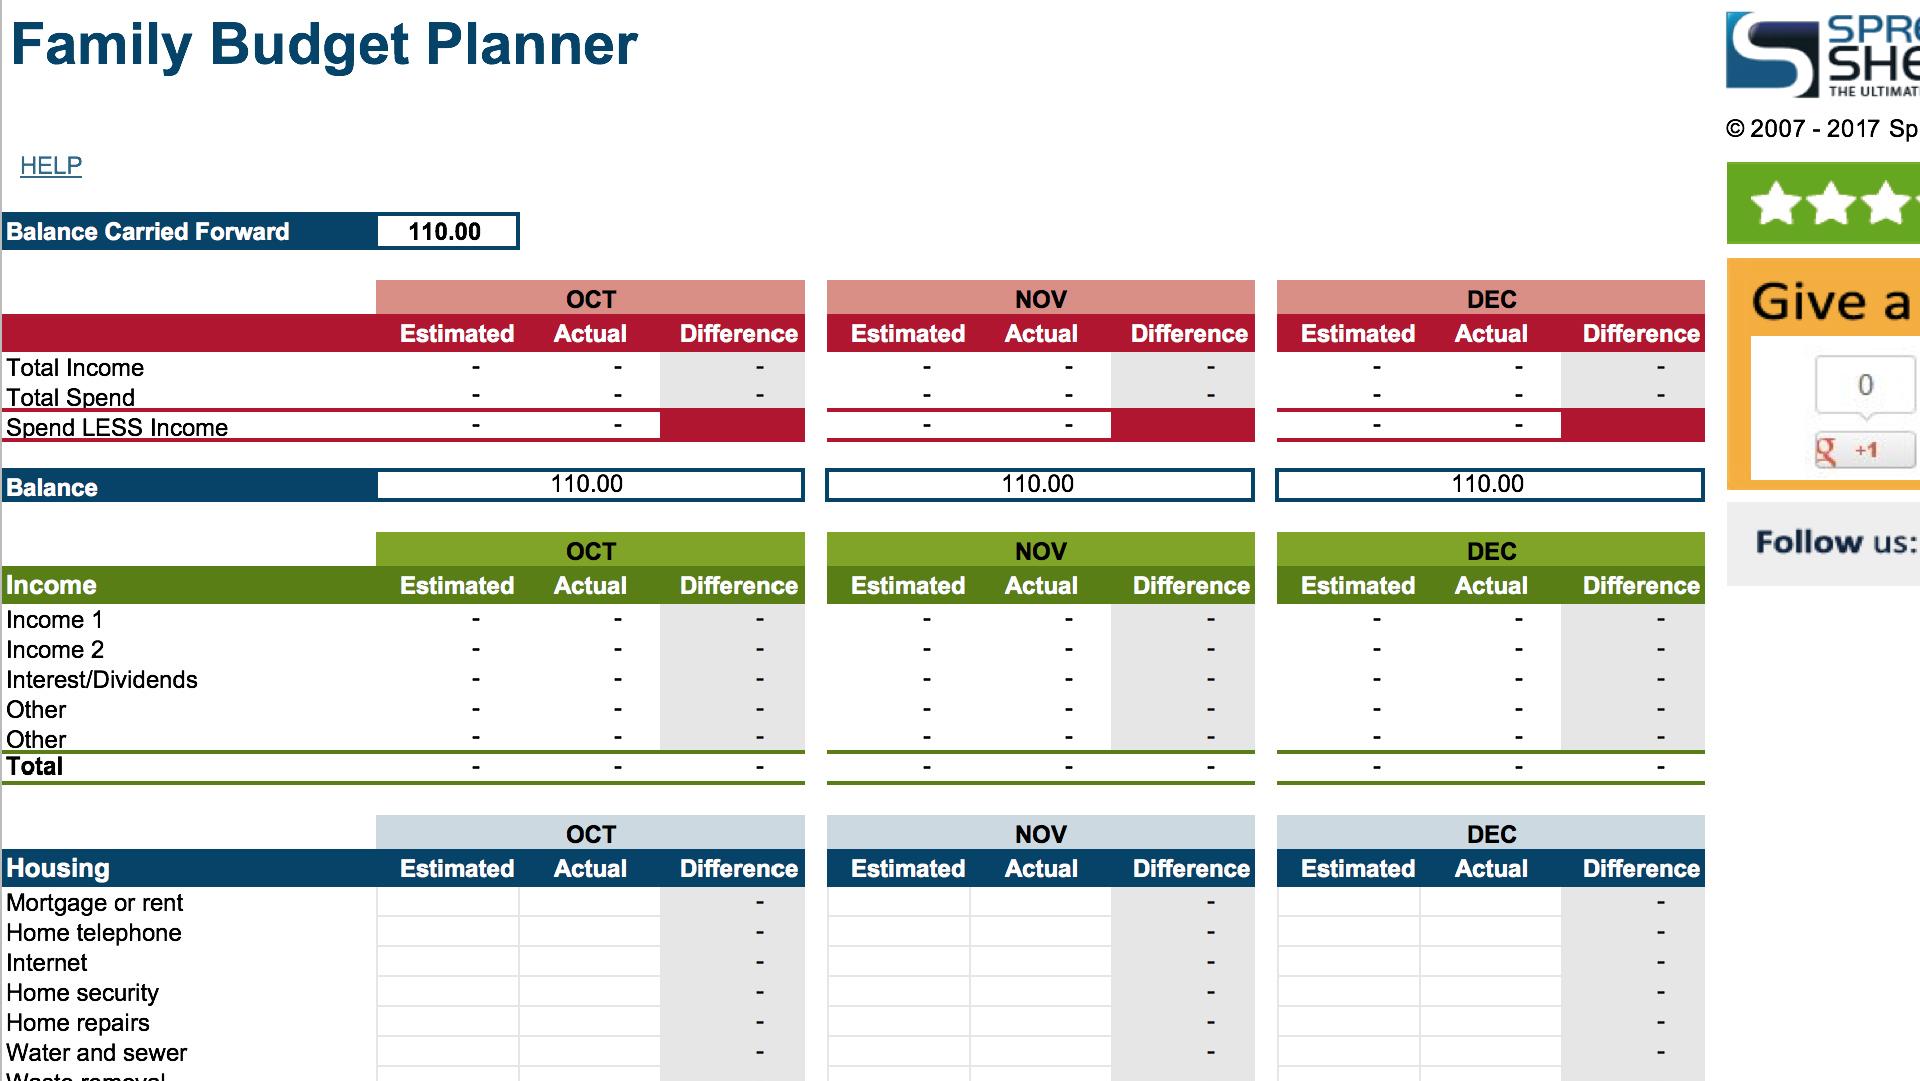 Annual Family Budget Spreadsheet Within 15 Easytouse Budget Templates  Gobankingrates